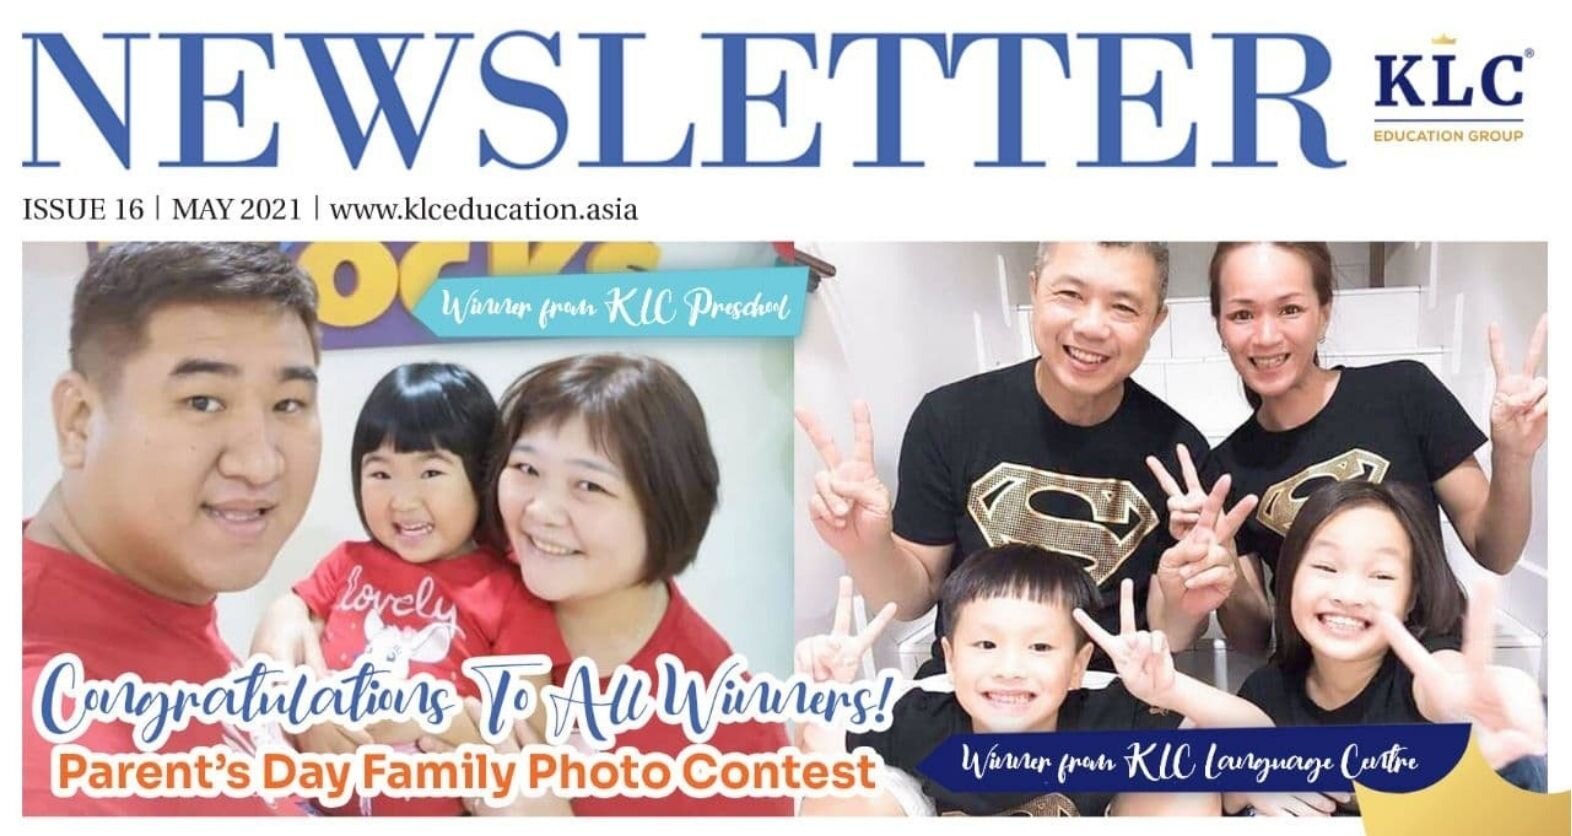 KLC Newsletter May 2021